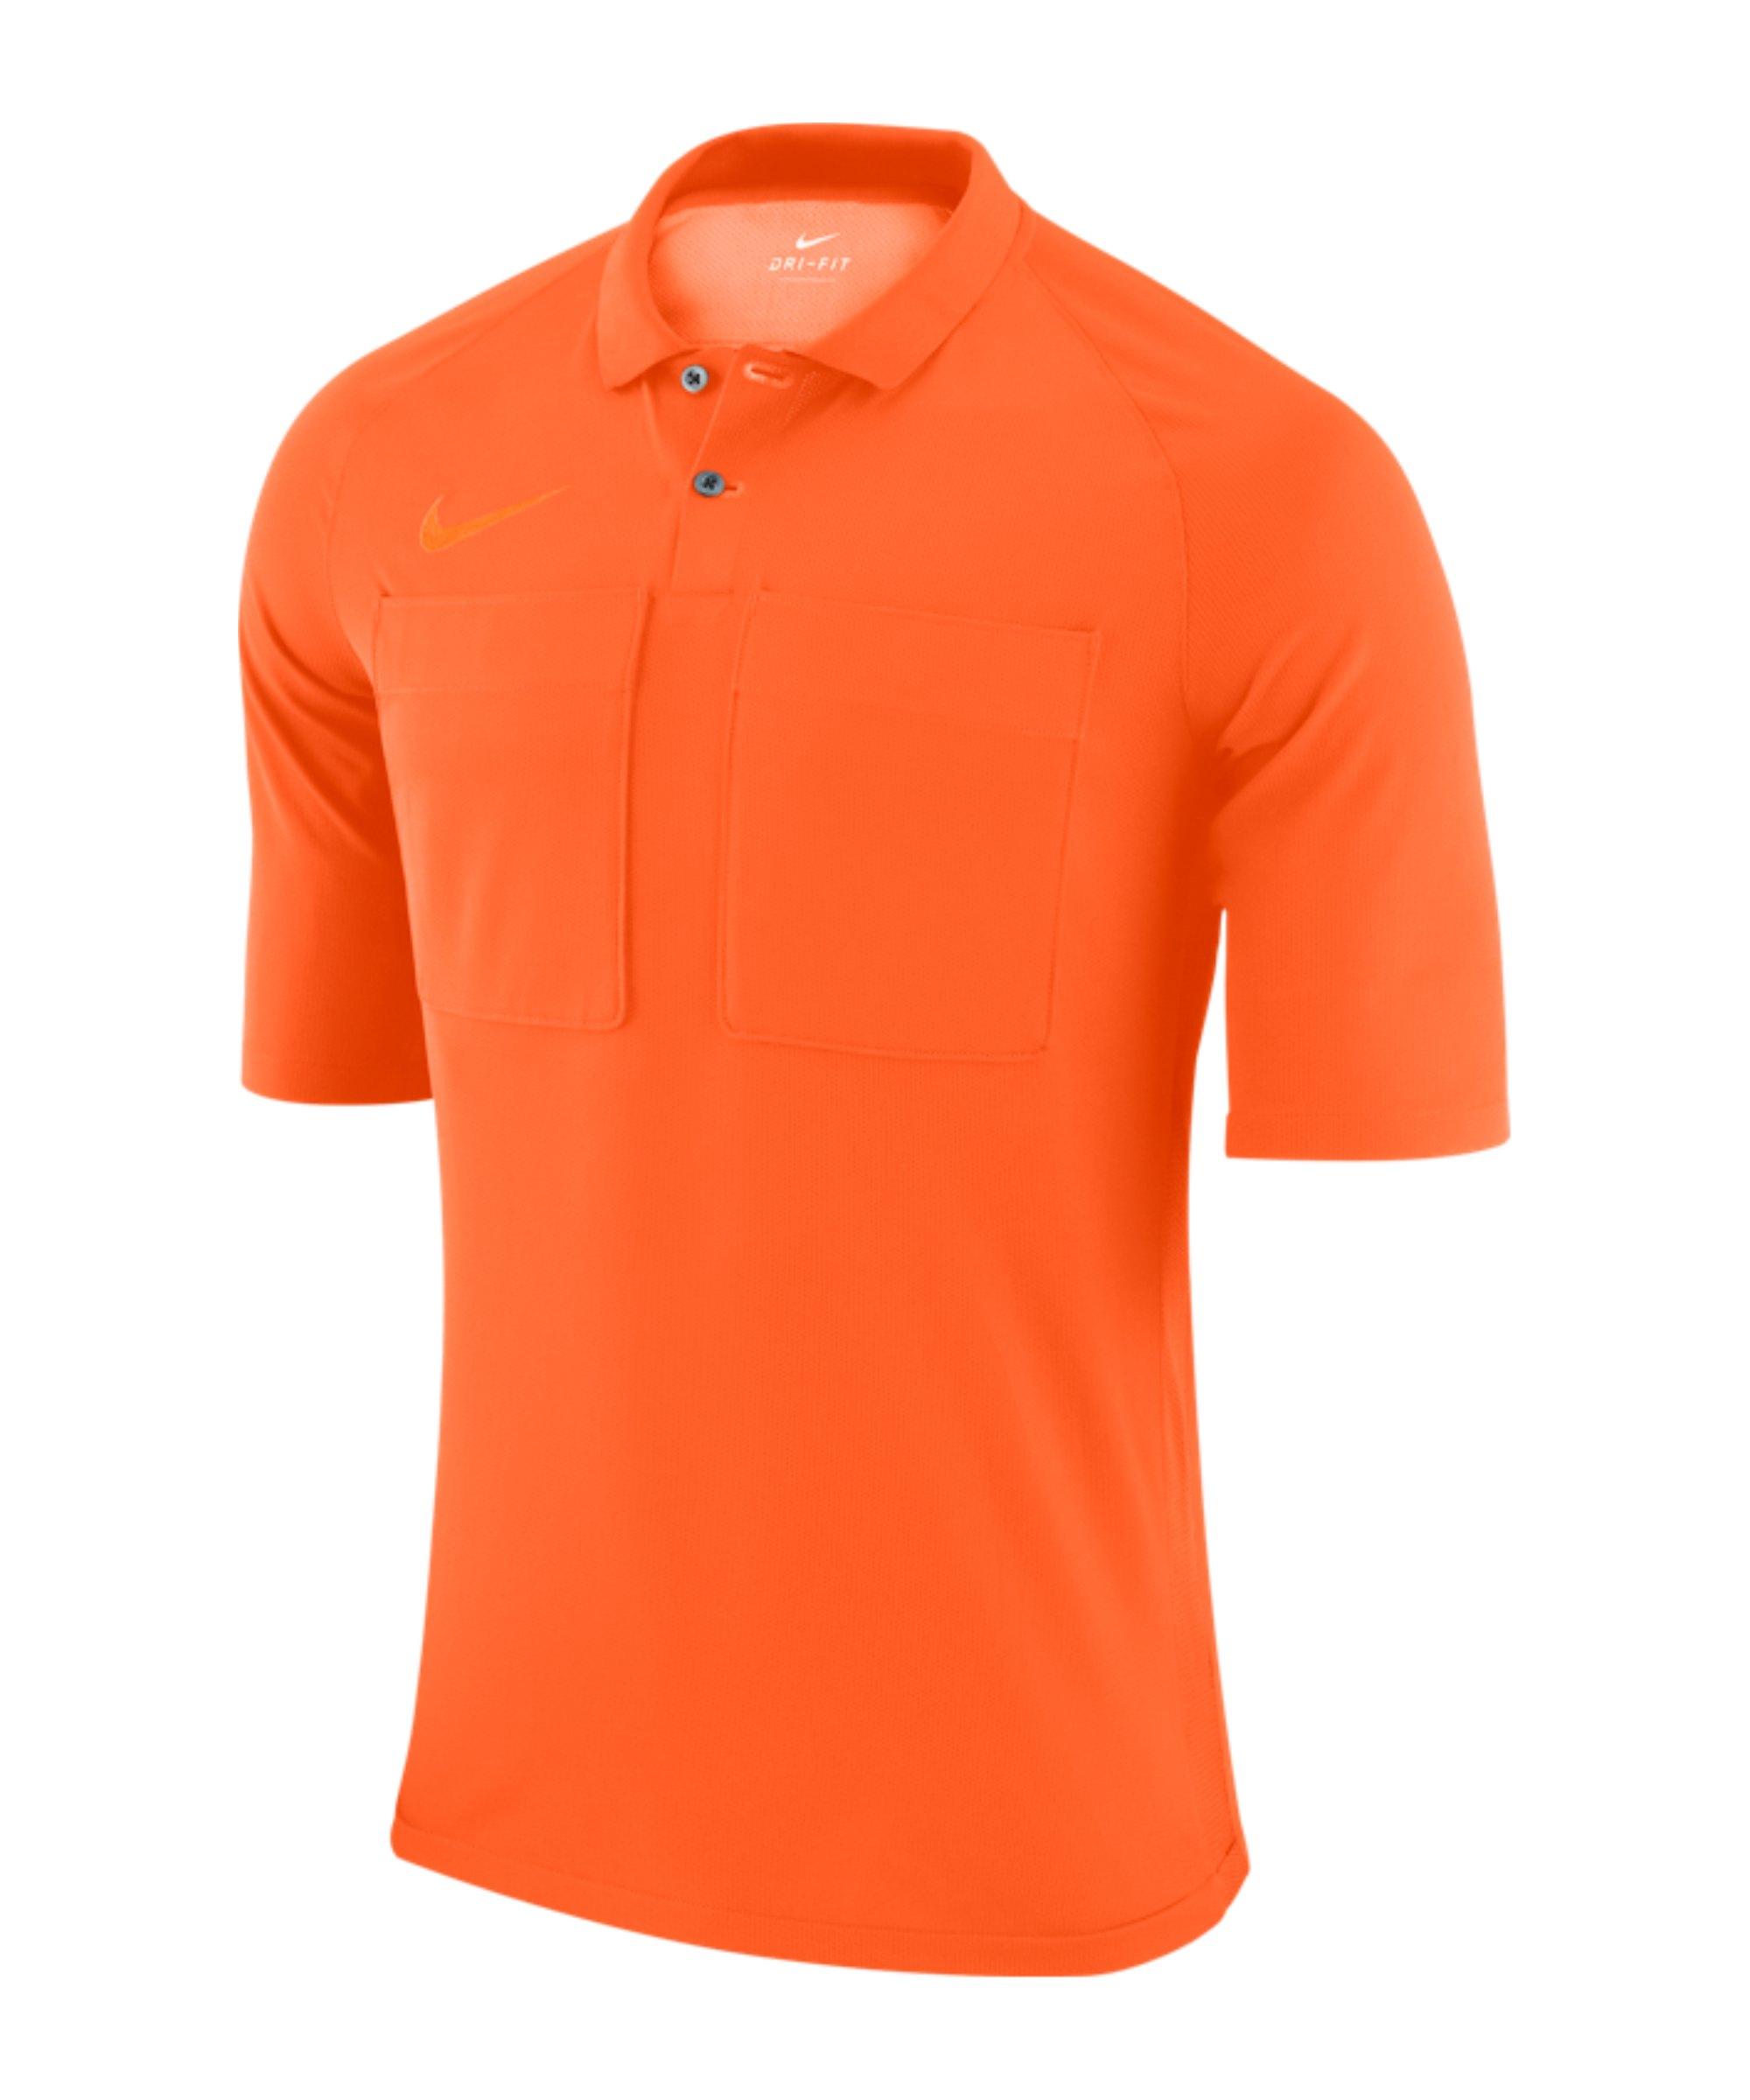 Nike Dry Referee Trikot kurzarm Orange F819 - orange